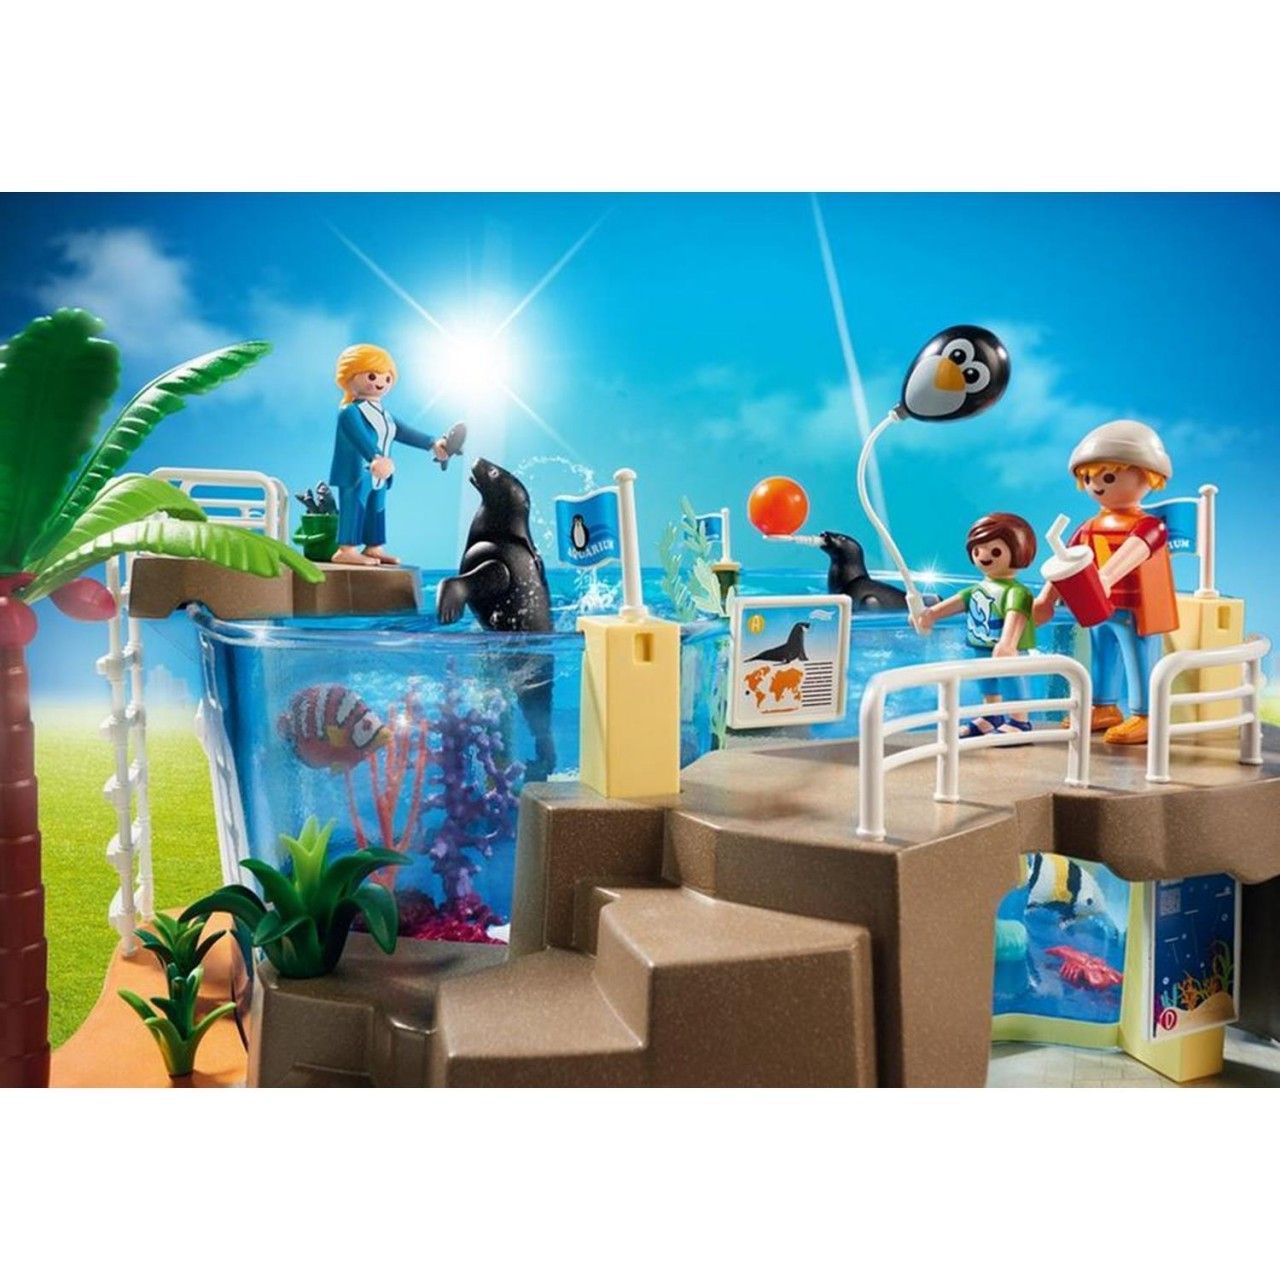 Playmobil 9060 Meeresaquarium